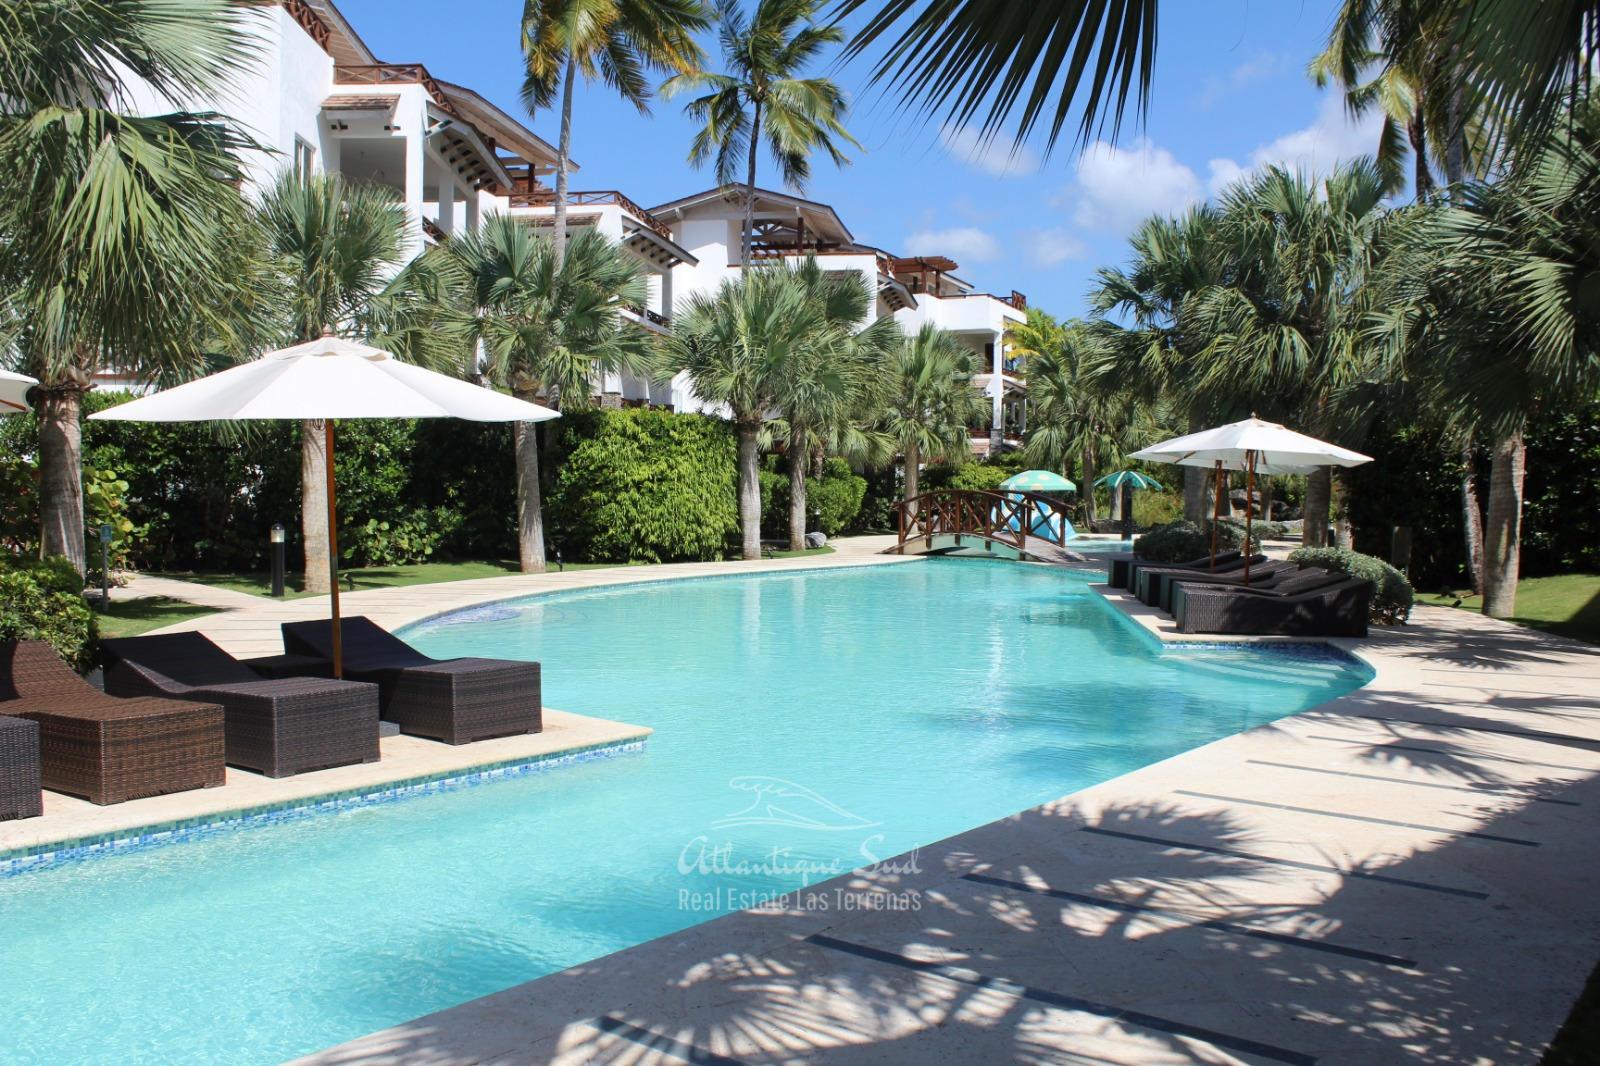 Apartments near the beach real estate las terrenas dominican republic 31 (2).jpg